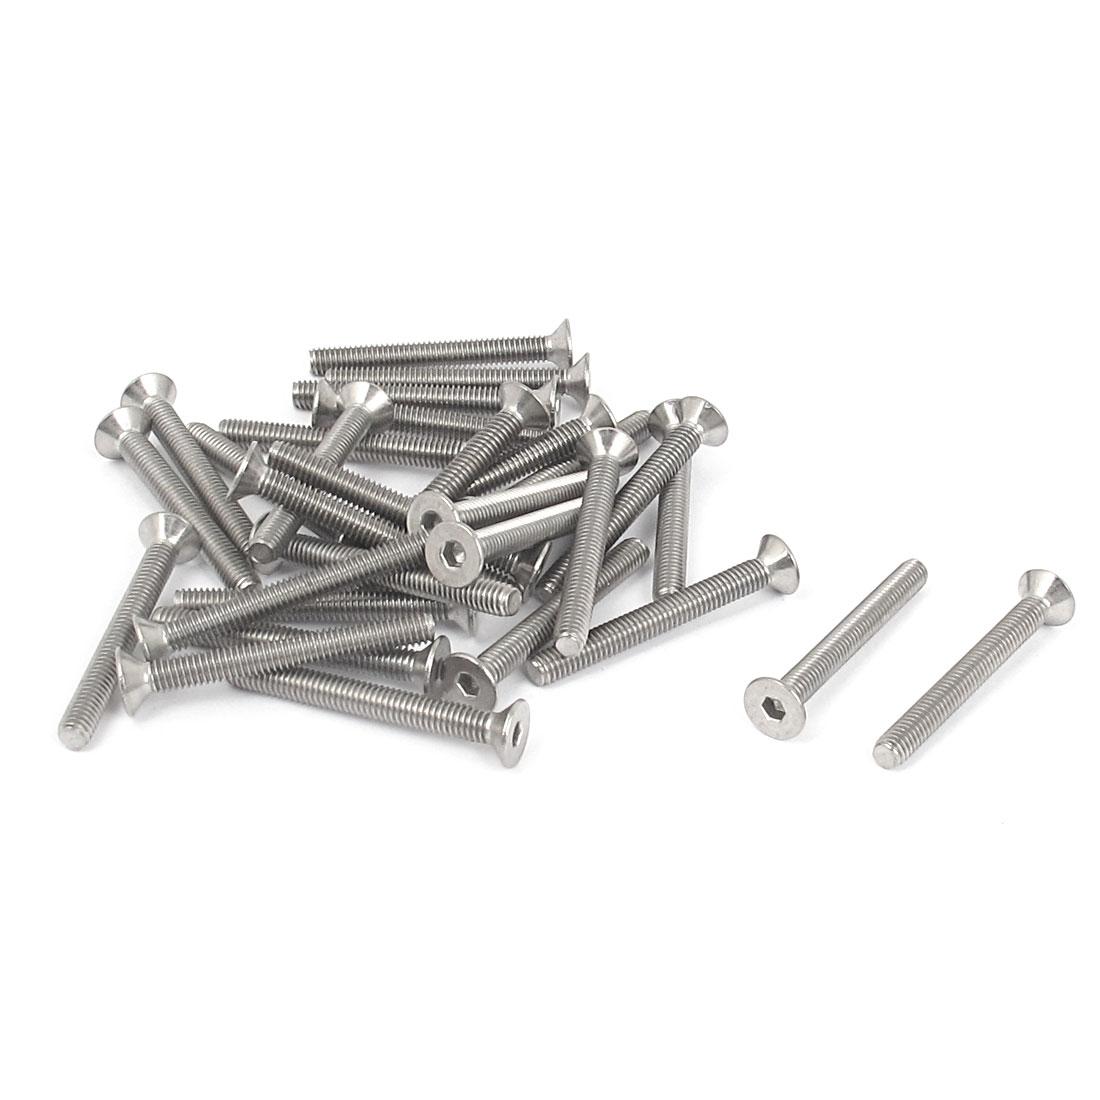 M4 x 35mm Metric 304 Stainless Steel Hex Socket Countersunk Flat Head Screw Bolts 30PCS